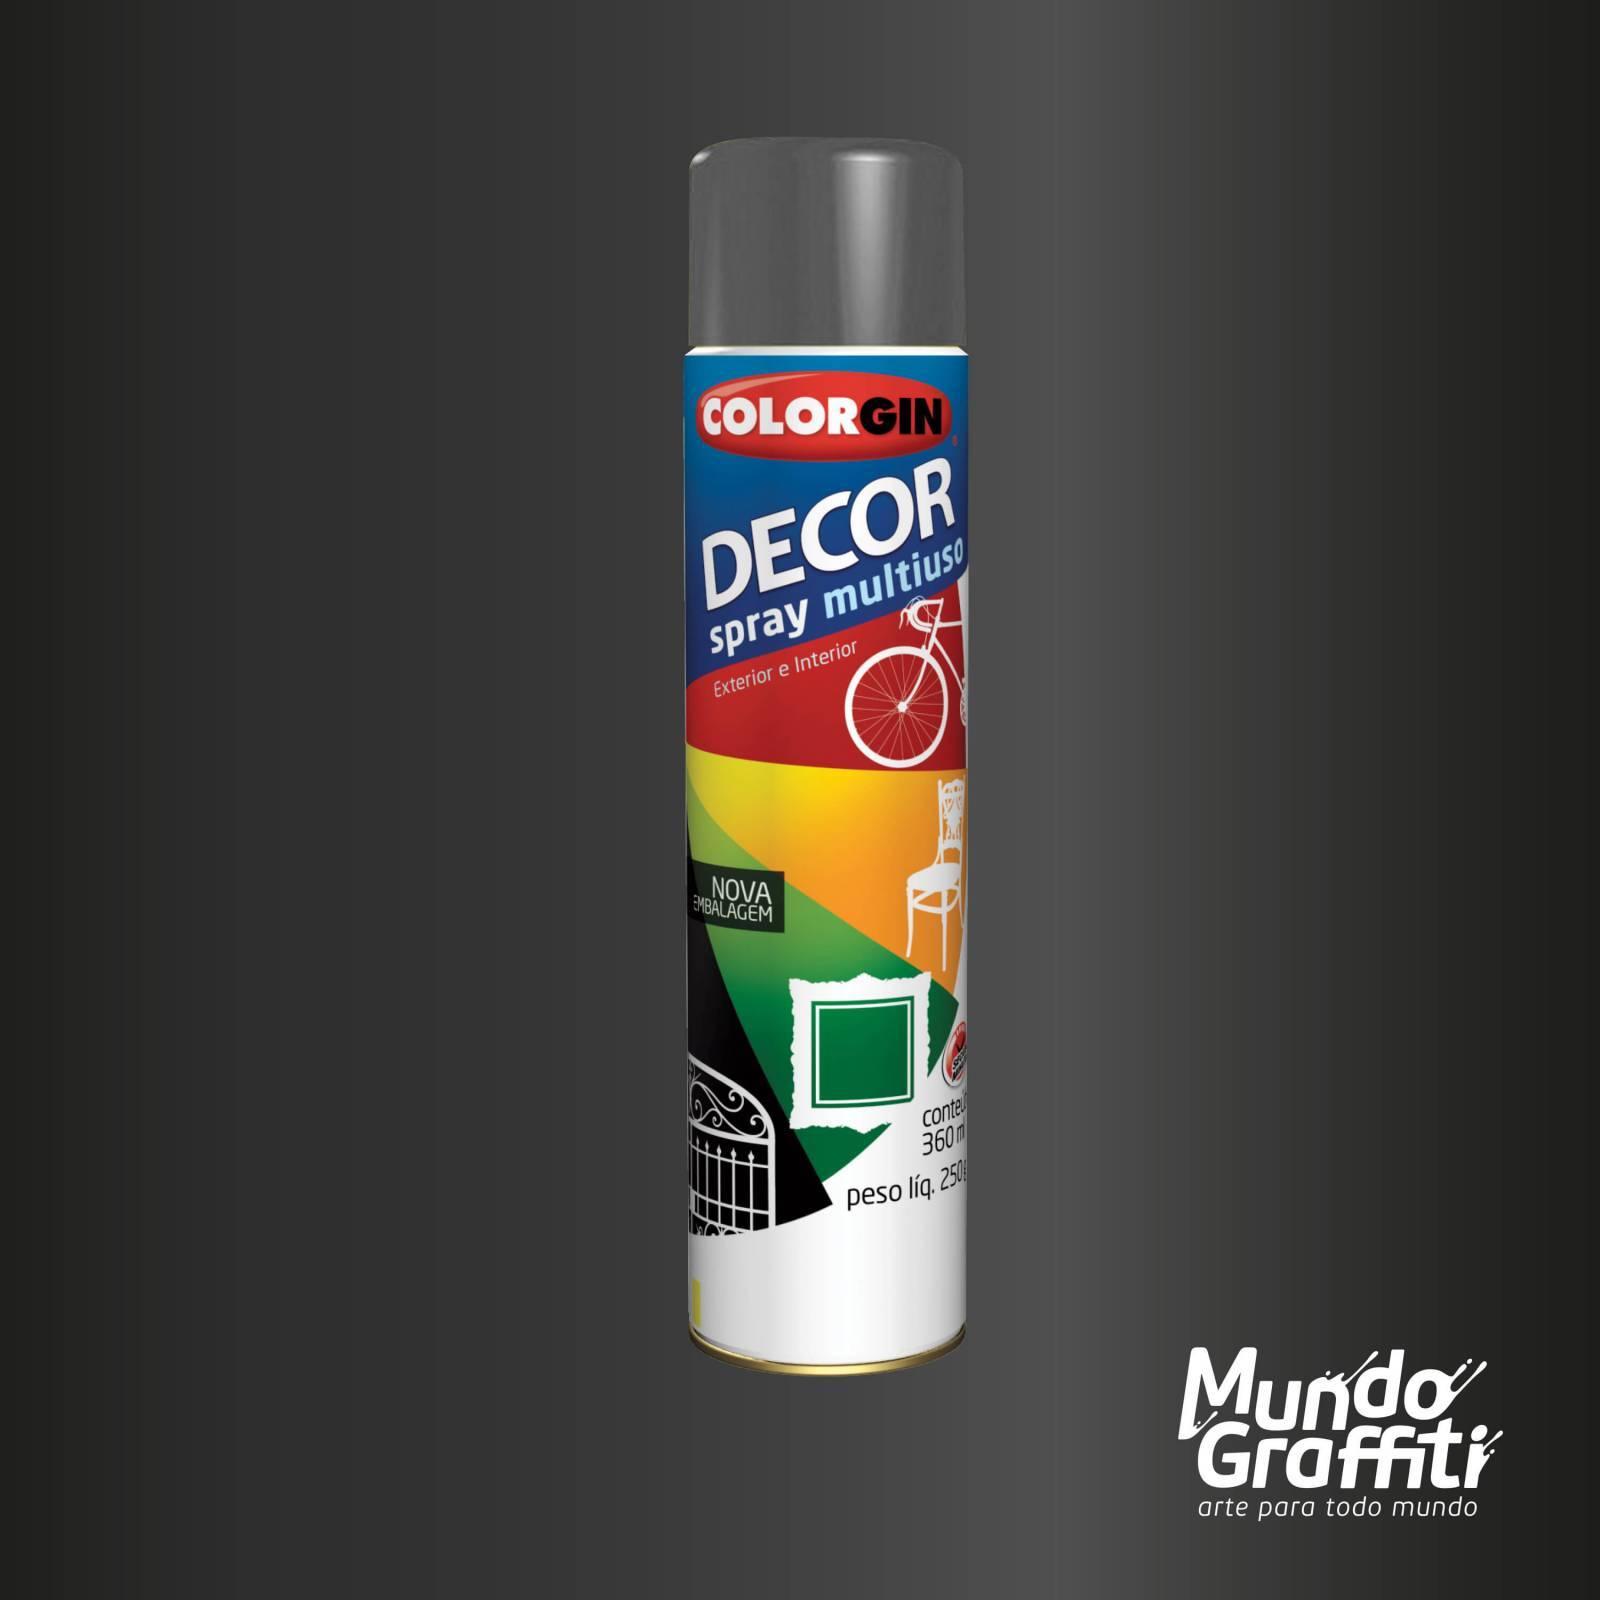 Tinta Spray Colorgin Decor 8661 Grafite Metalico 360ml - Mundo Graffiti